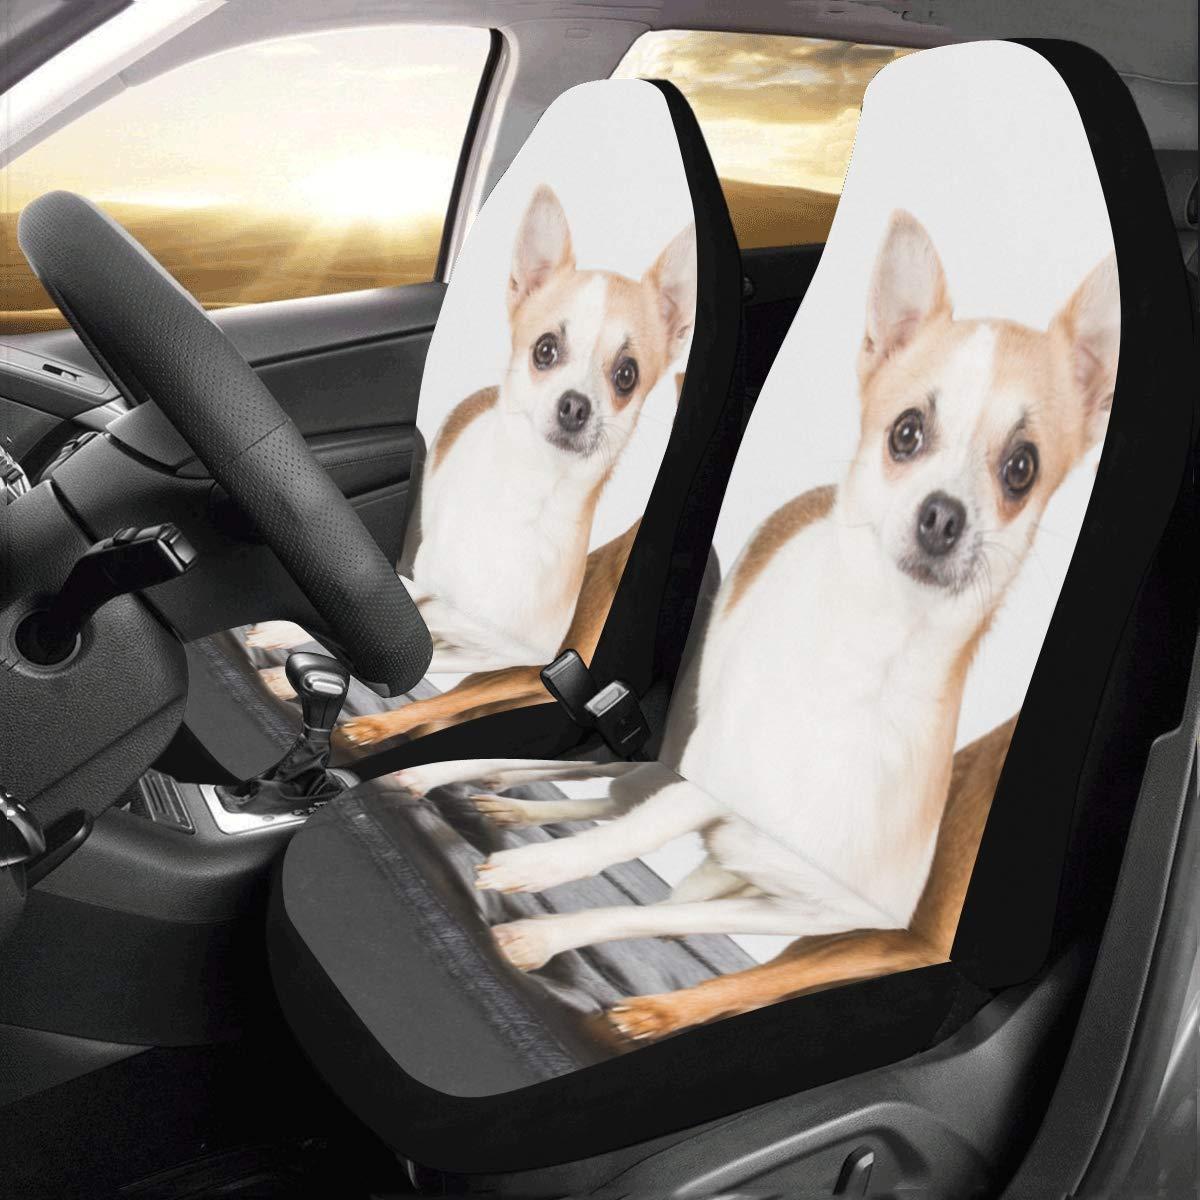 Amazon.com: Cute Small Chihuahua Puppy Dog